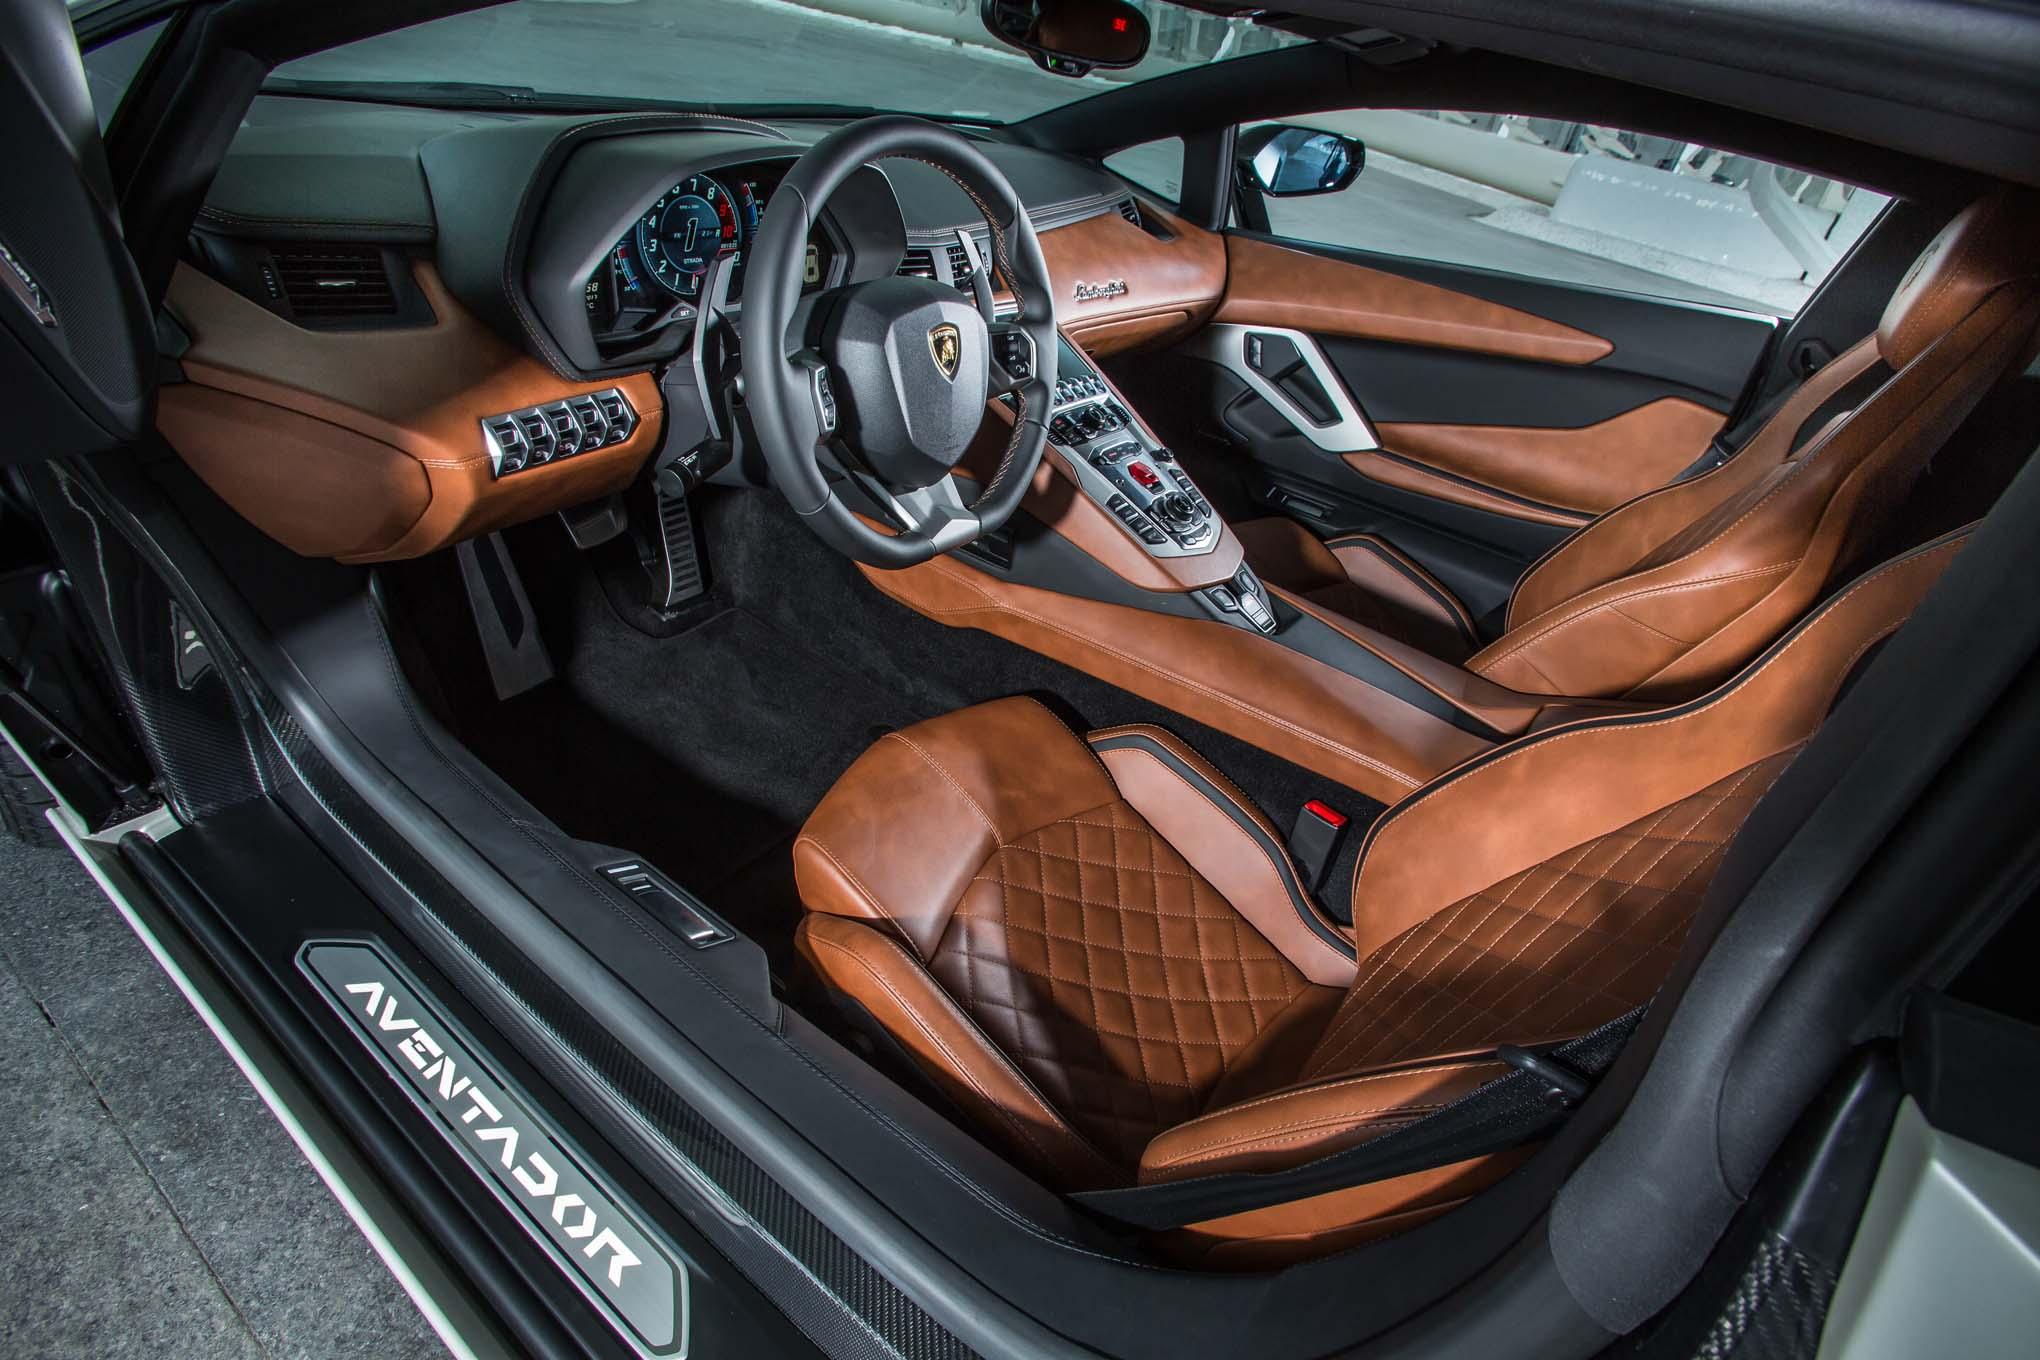 2018 Lamborghini Aventador S Interior 03 Motor Trend En Espanol